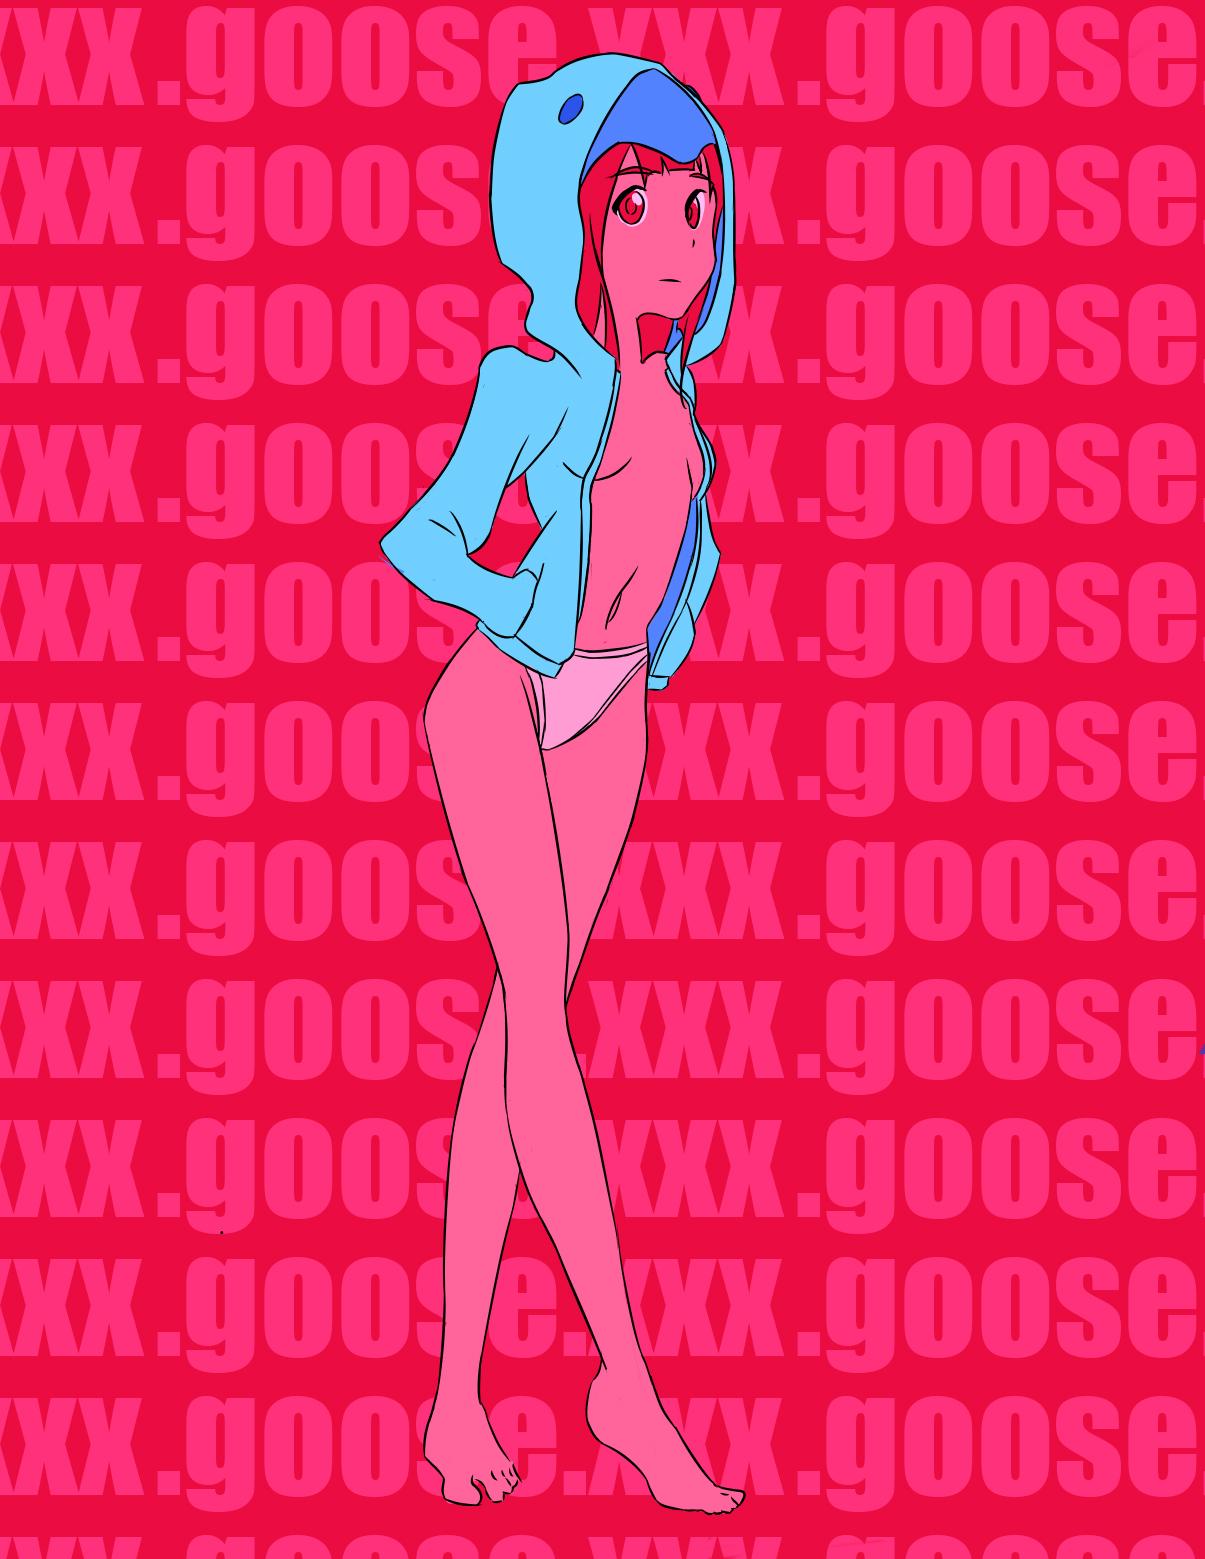 Goosee